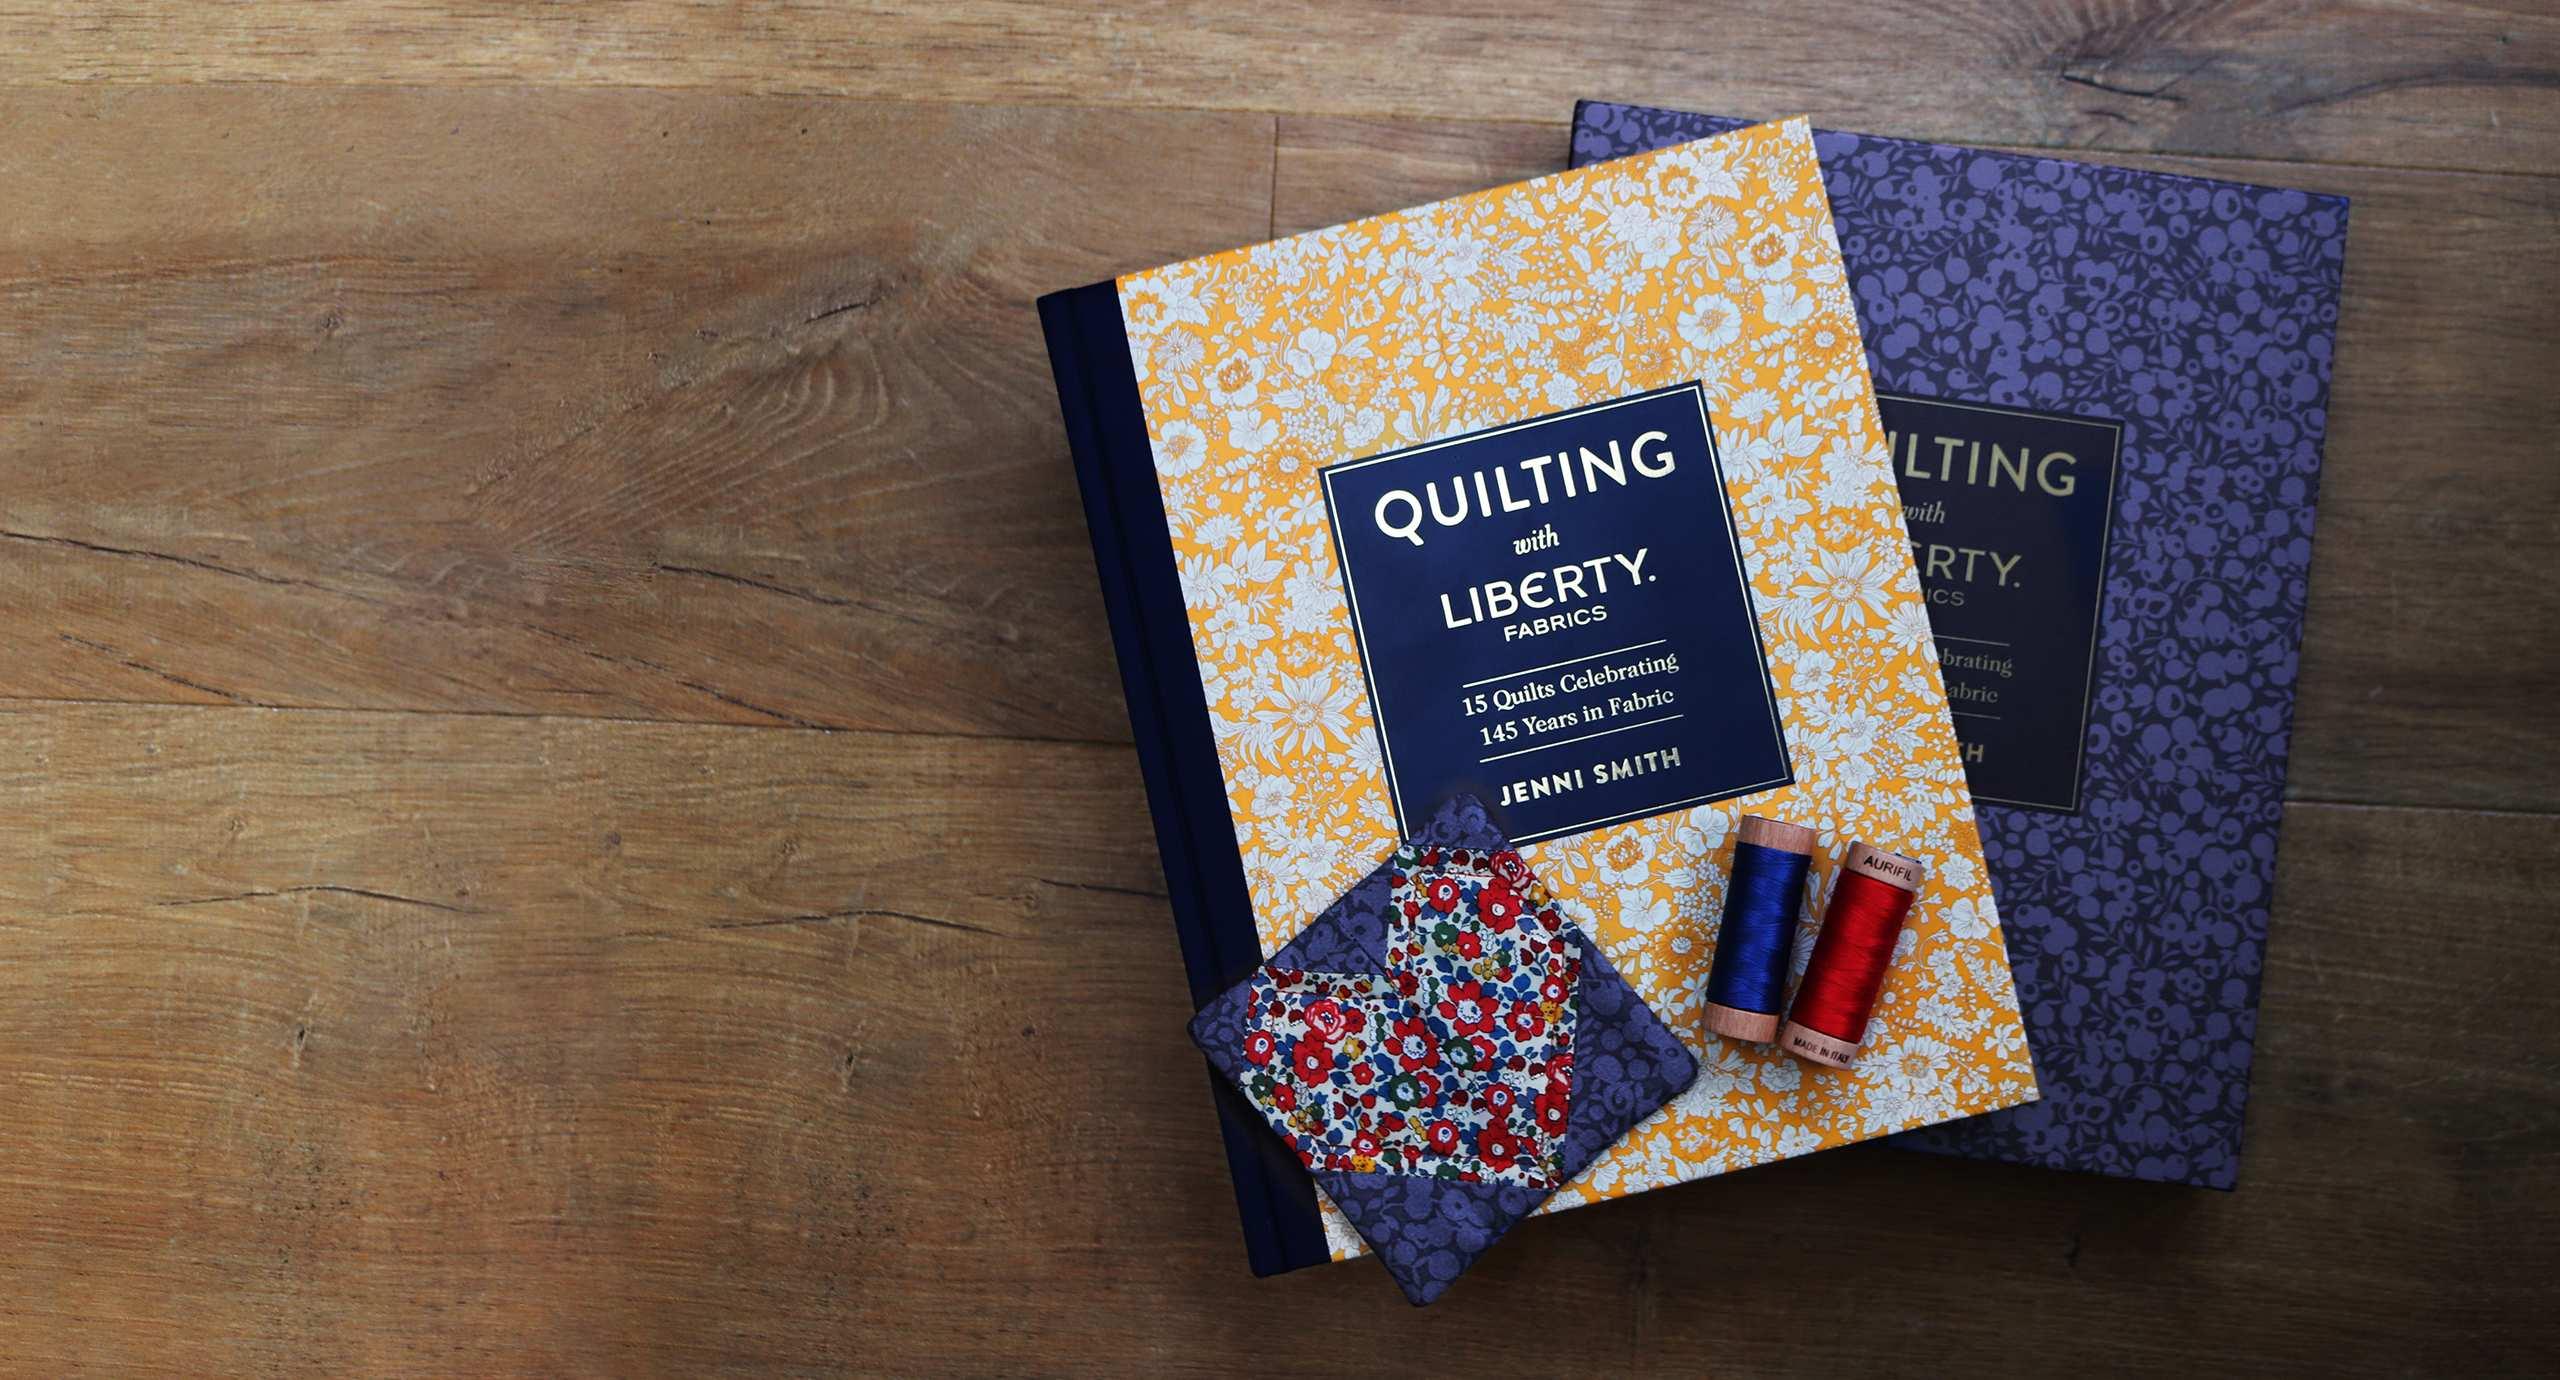 Jenni Smith Quilting with Liberty Fabrics